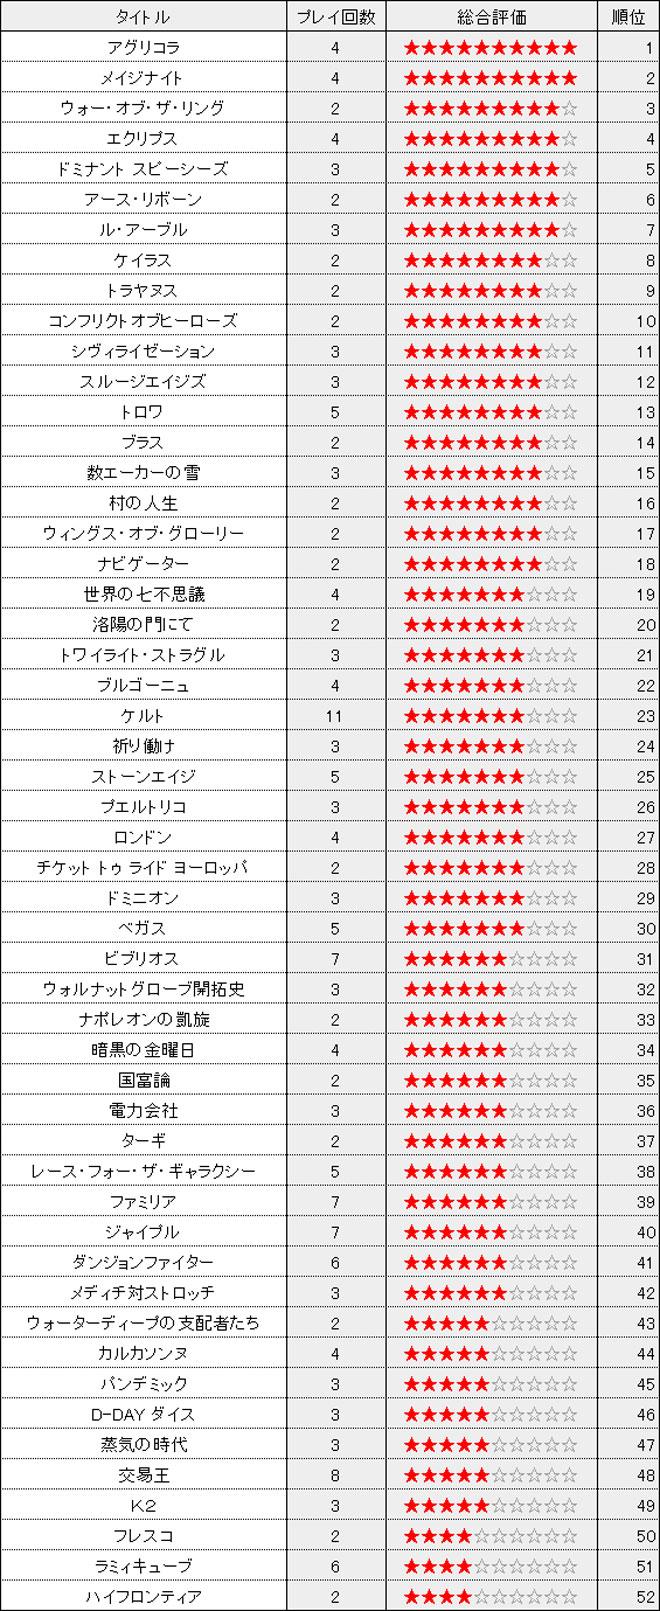 ranking121201.jpg